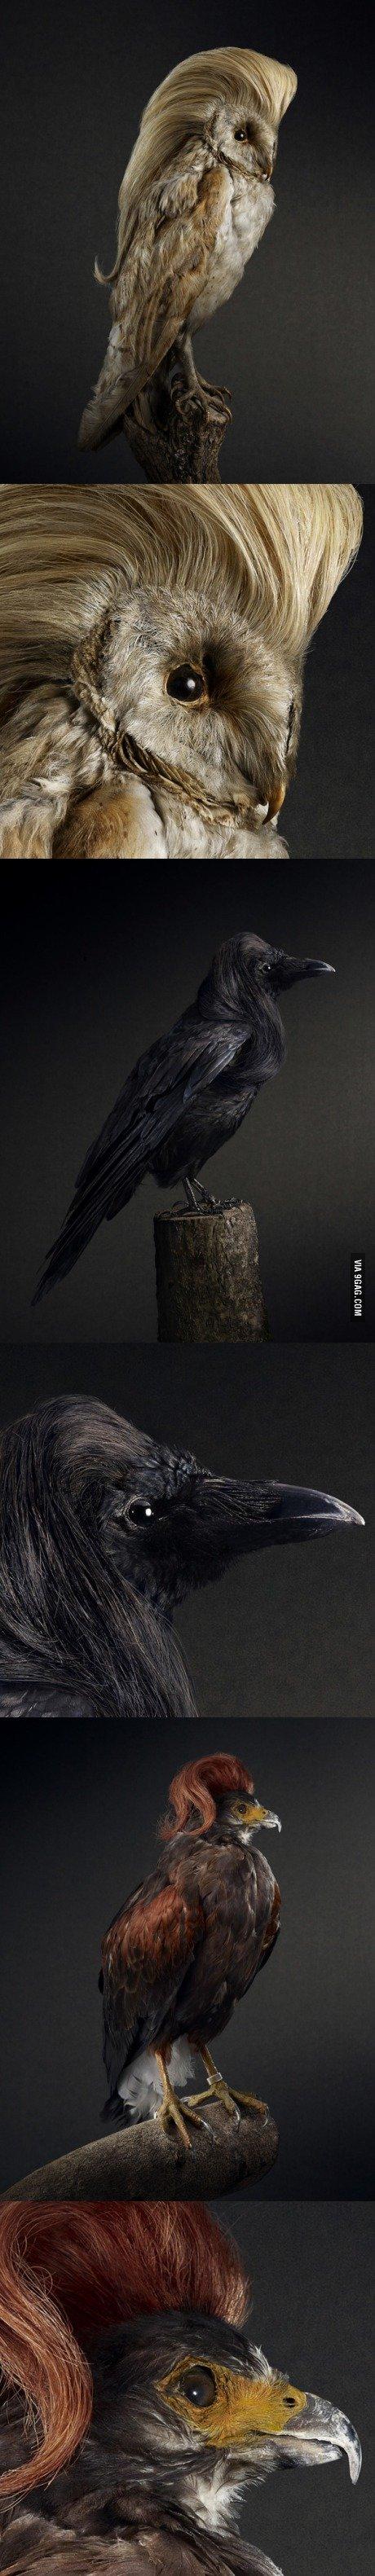 Birds with amazing hair.. .